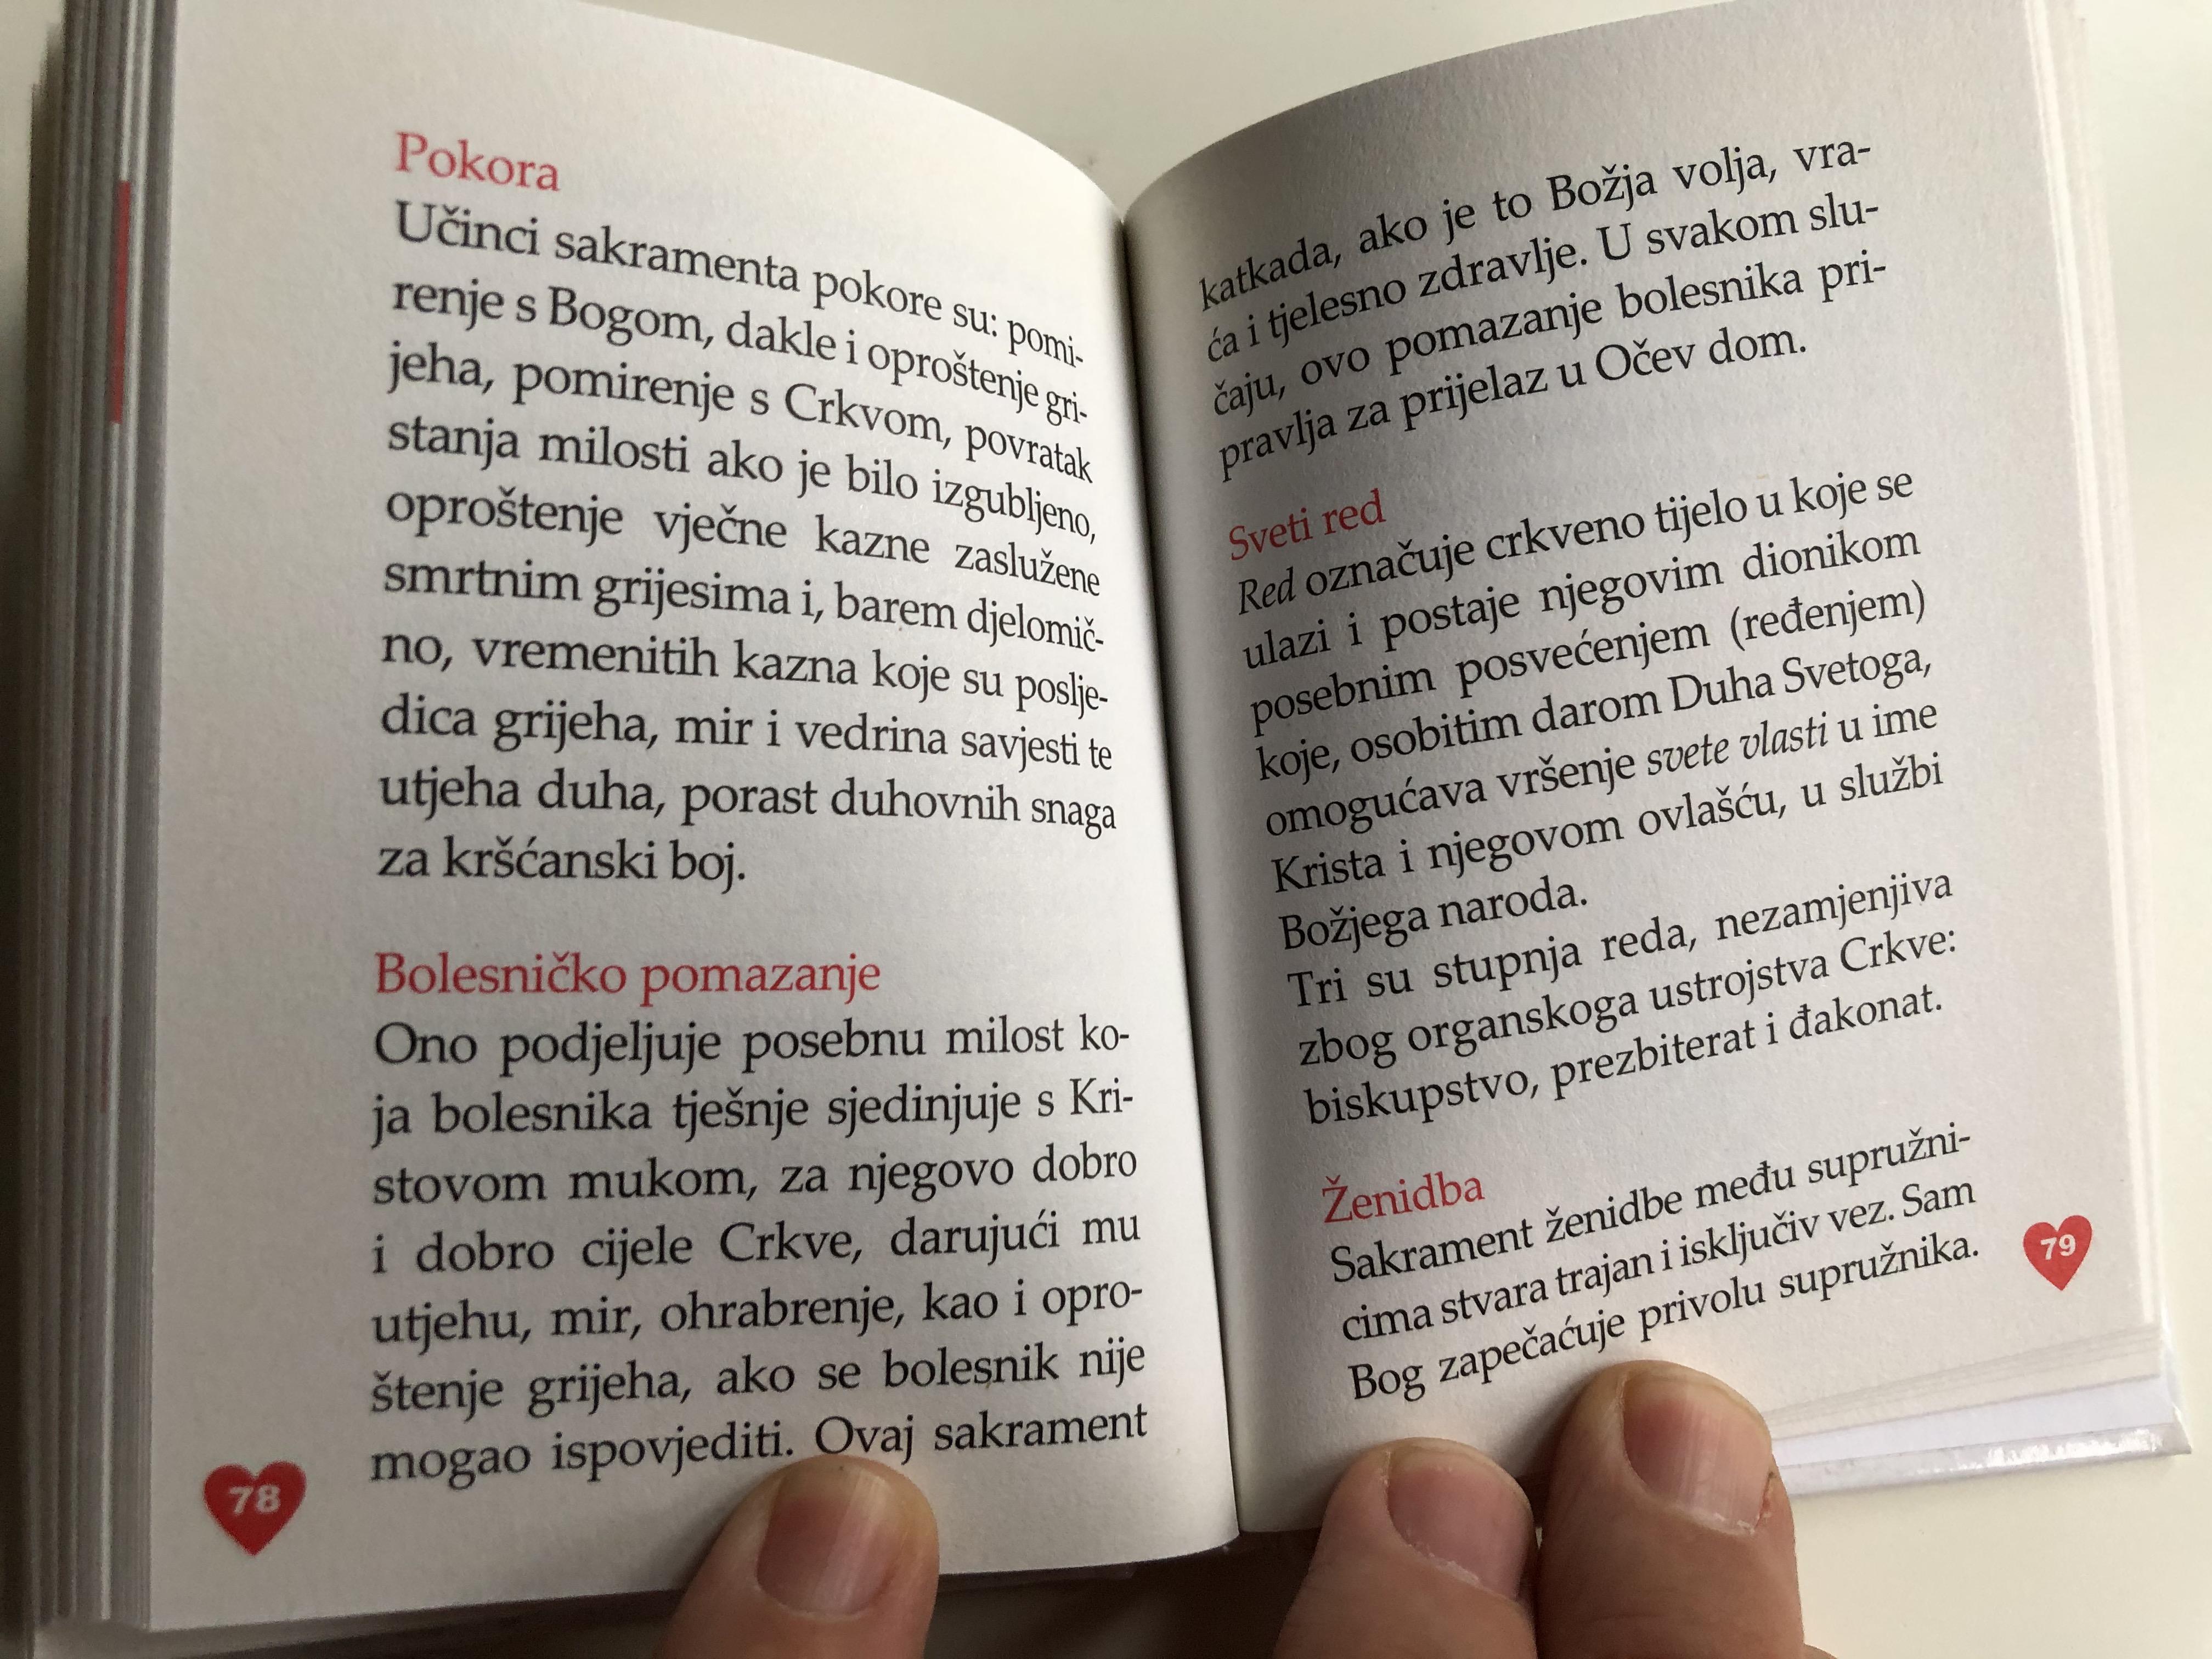 croatian-language-prayer-of-pope-francis-croatian-catholic-prayer-book-small-size-5.jpg